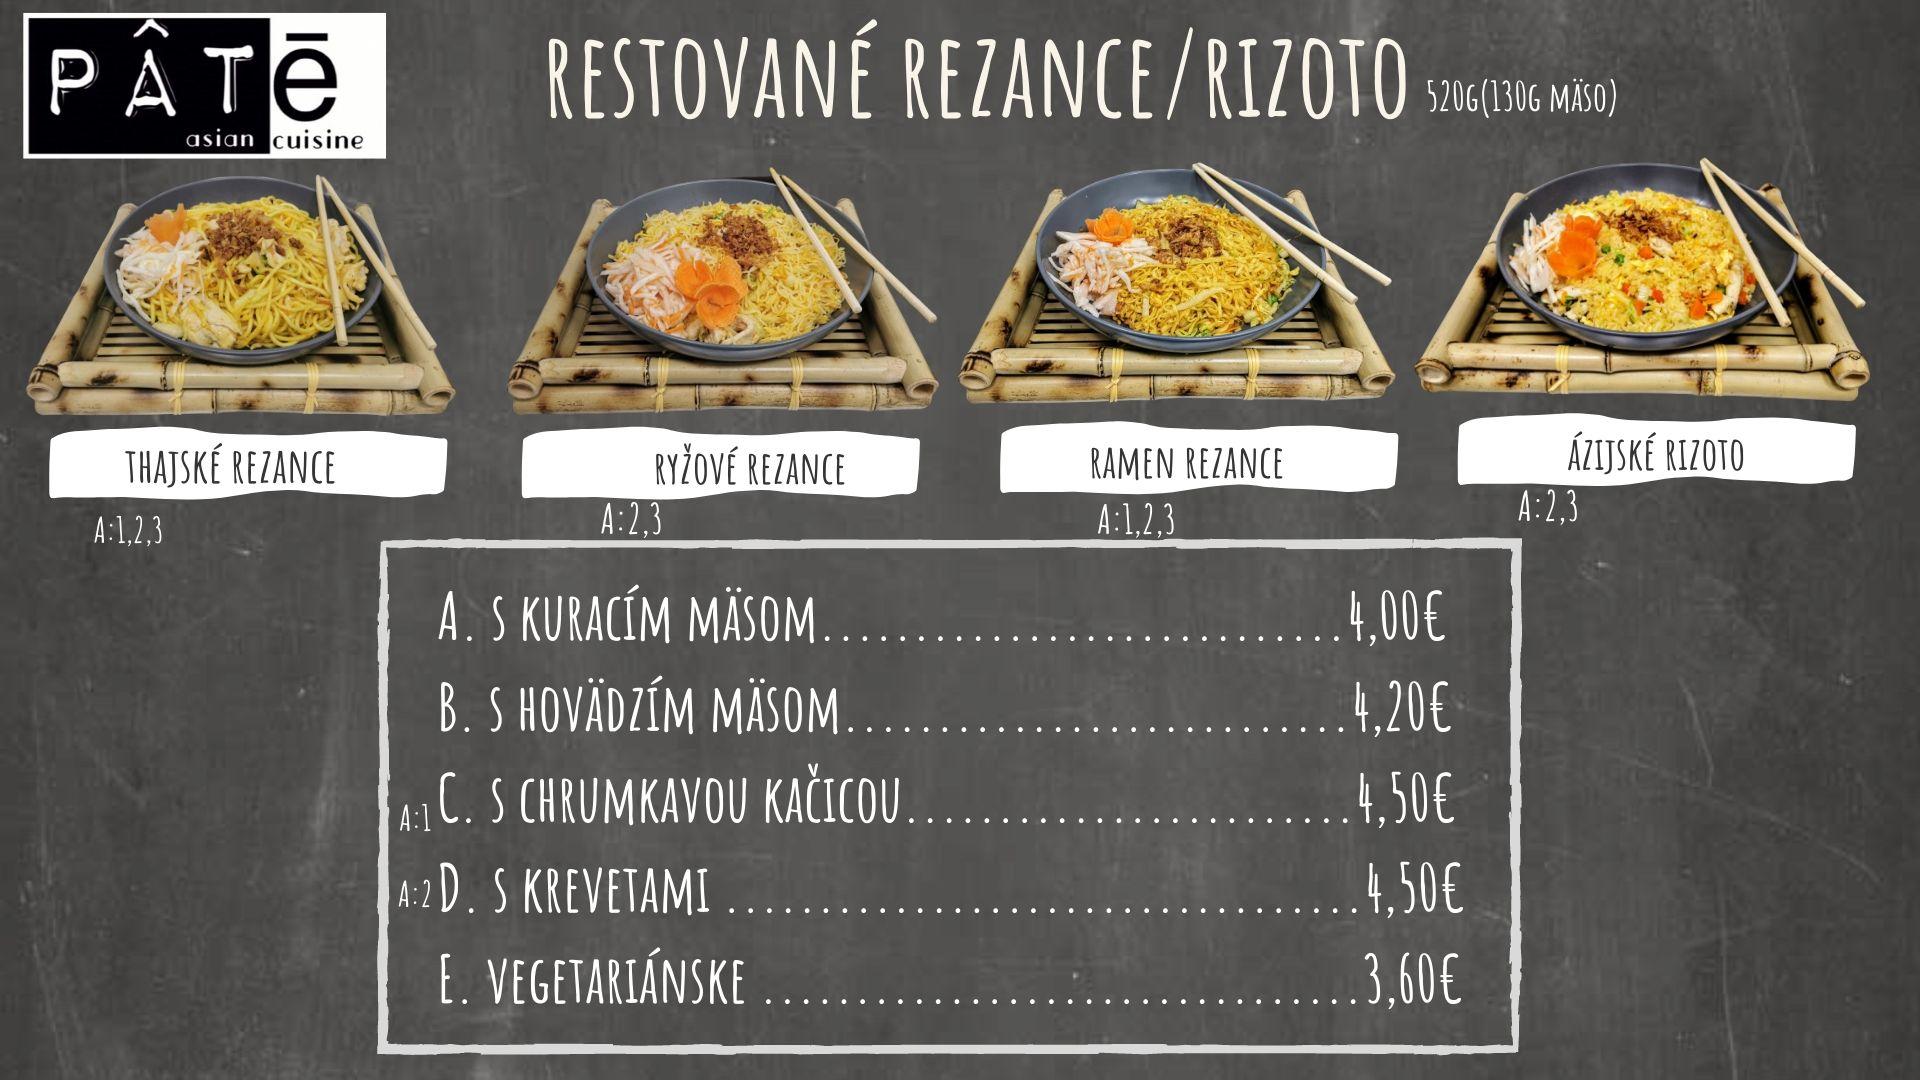 Restované rezance a rizoto